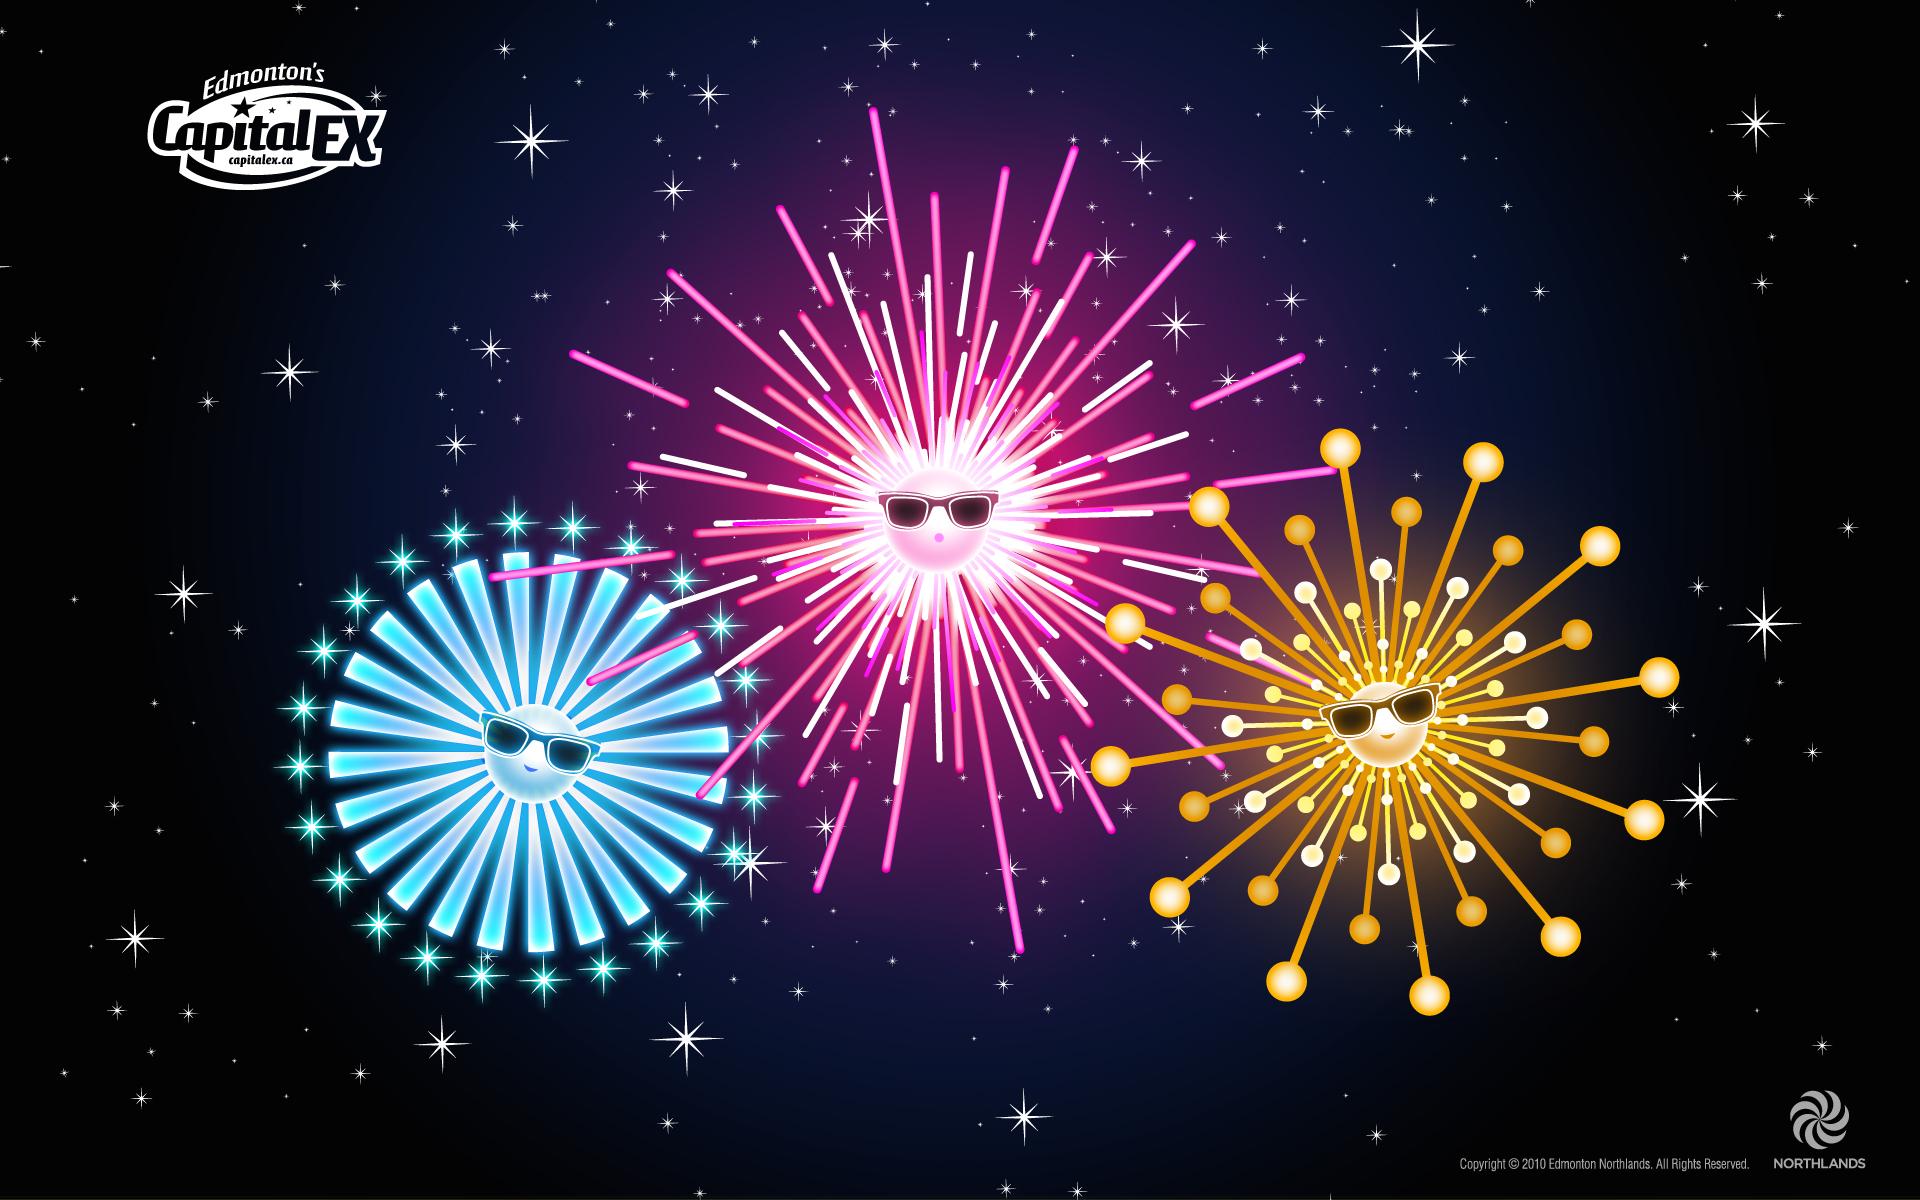 Cool Fireworks Wallpaper